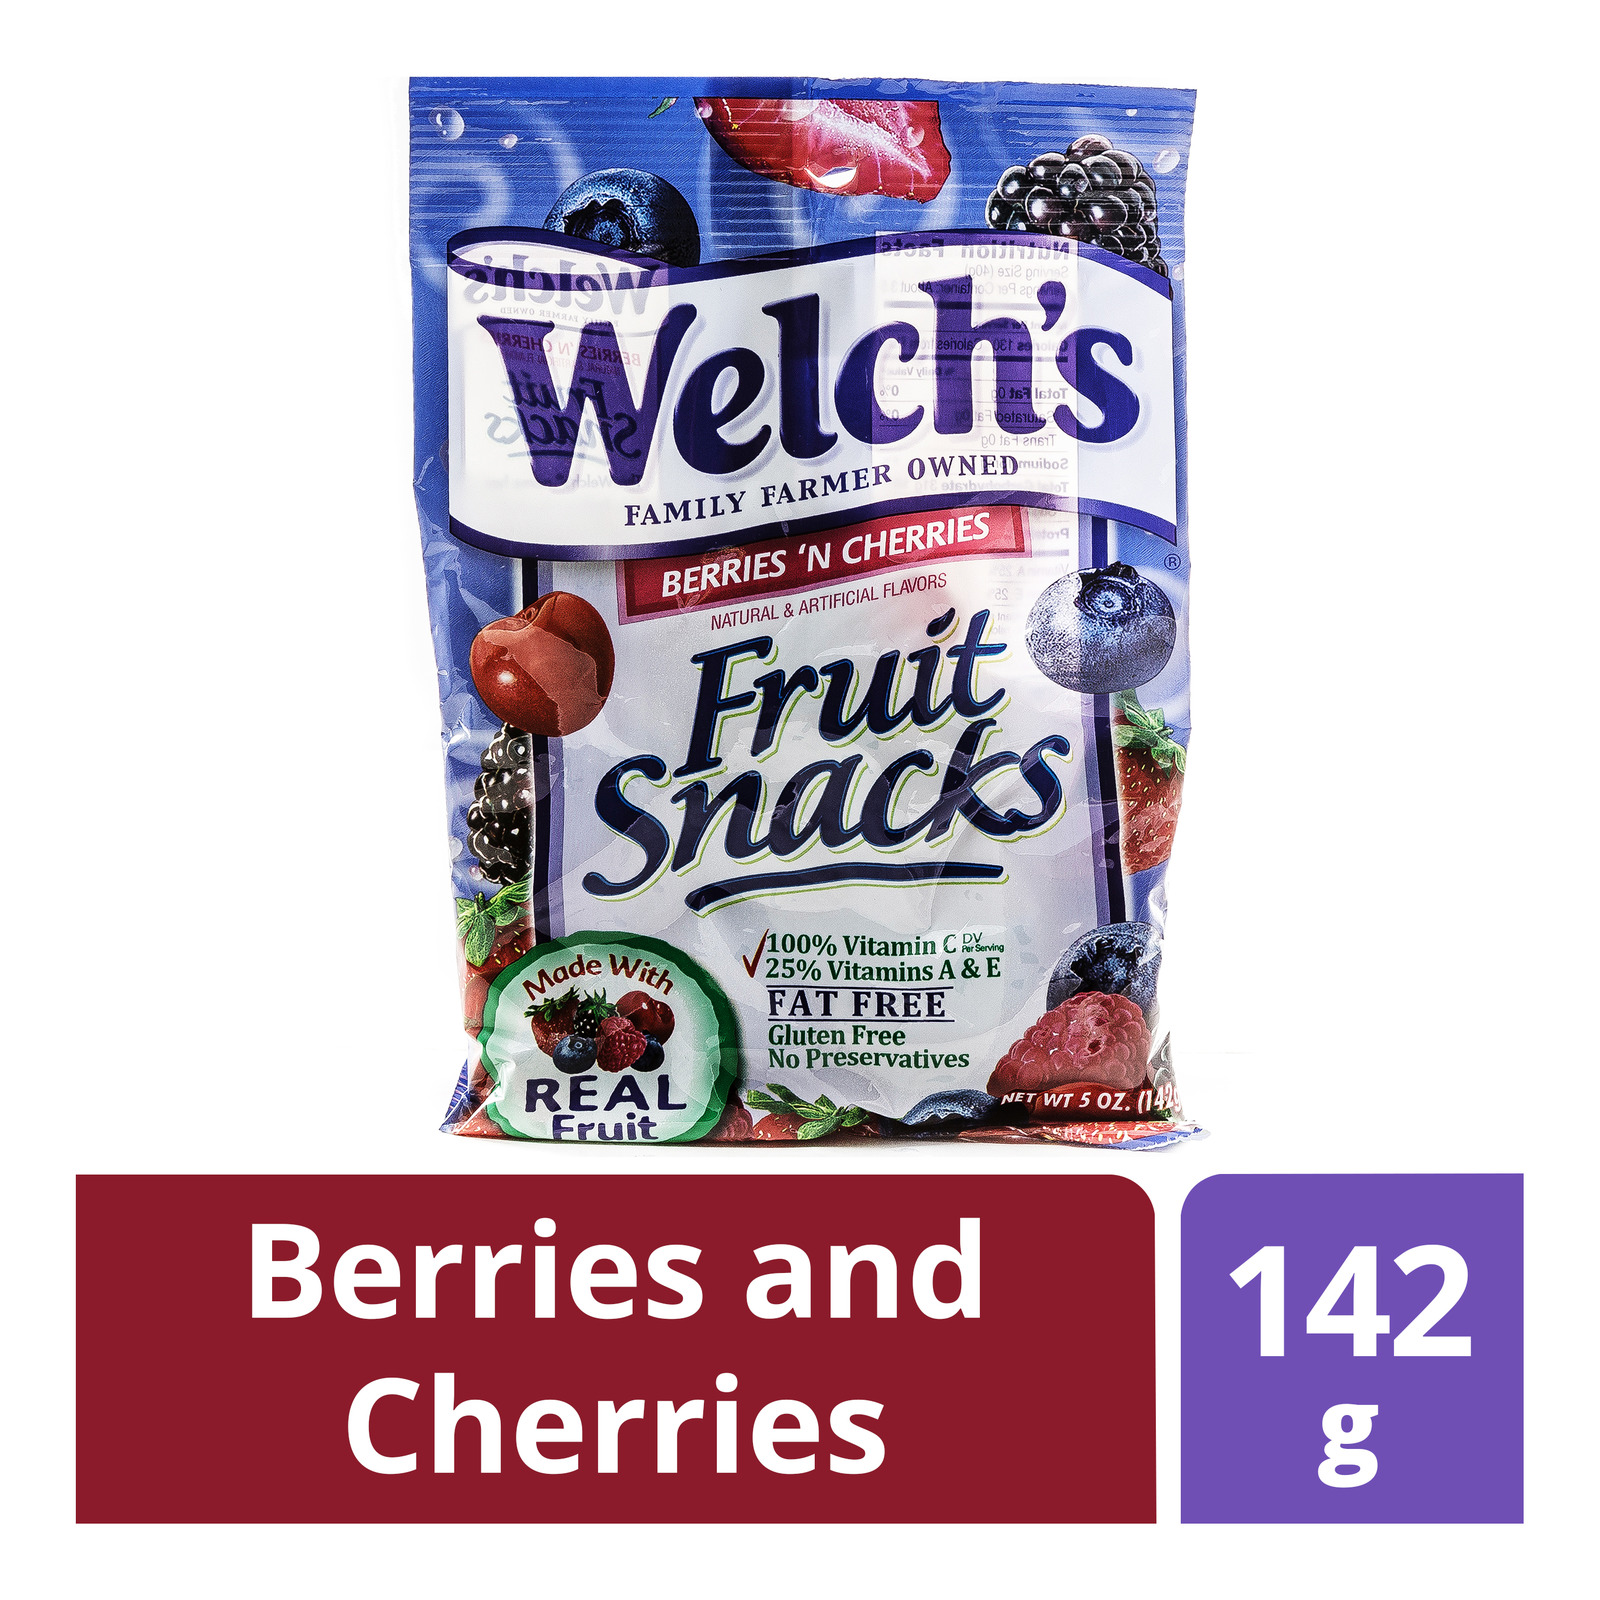 Welch's Fruit Snacks - Berries and Cherries